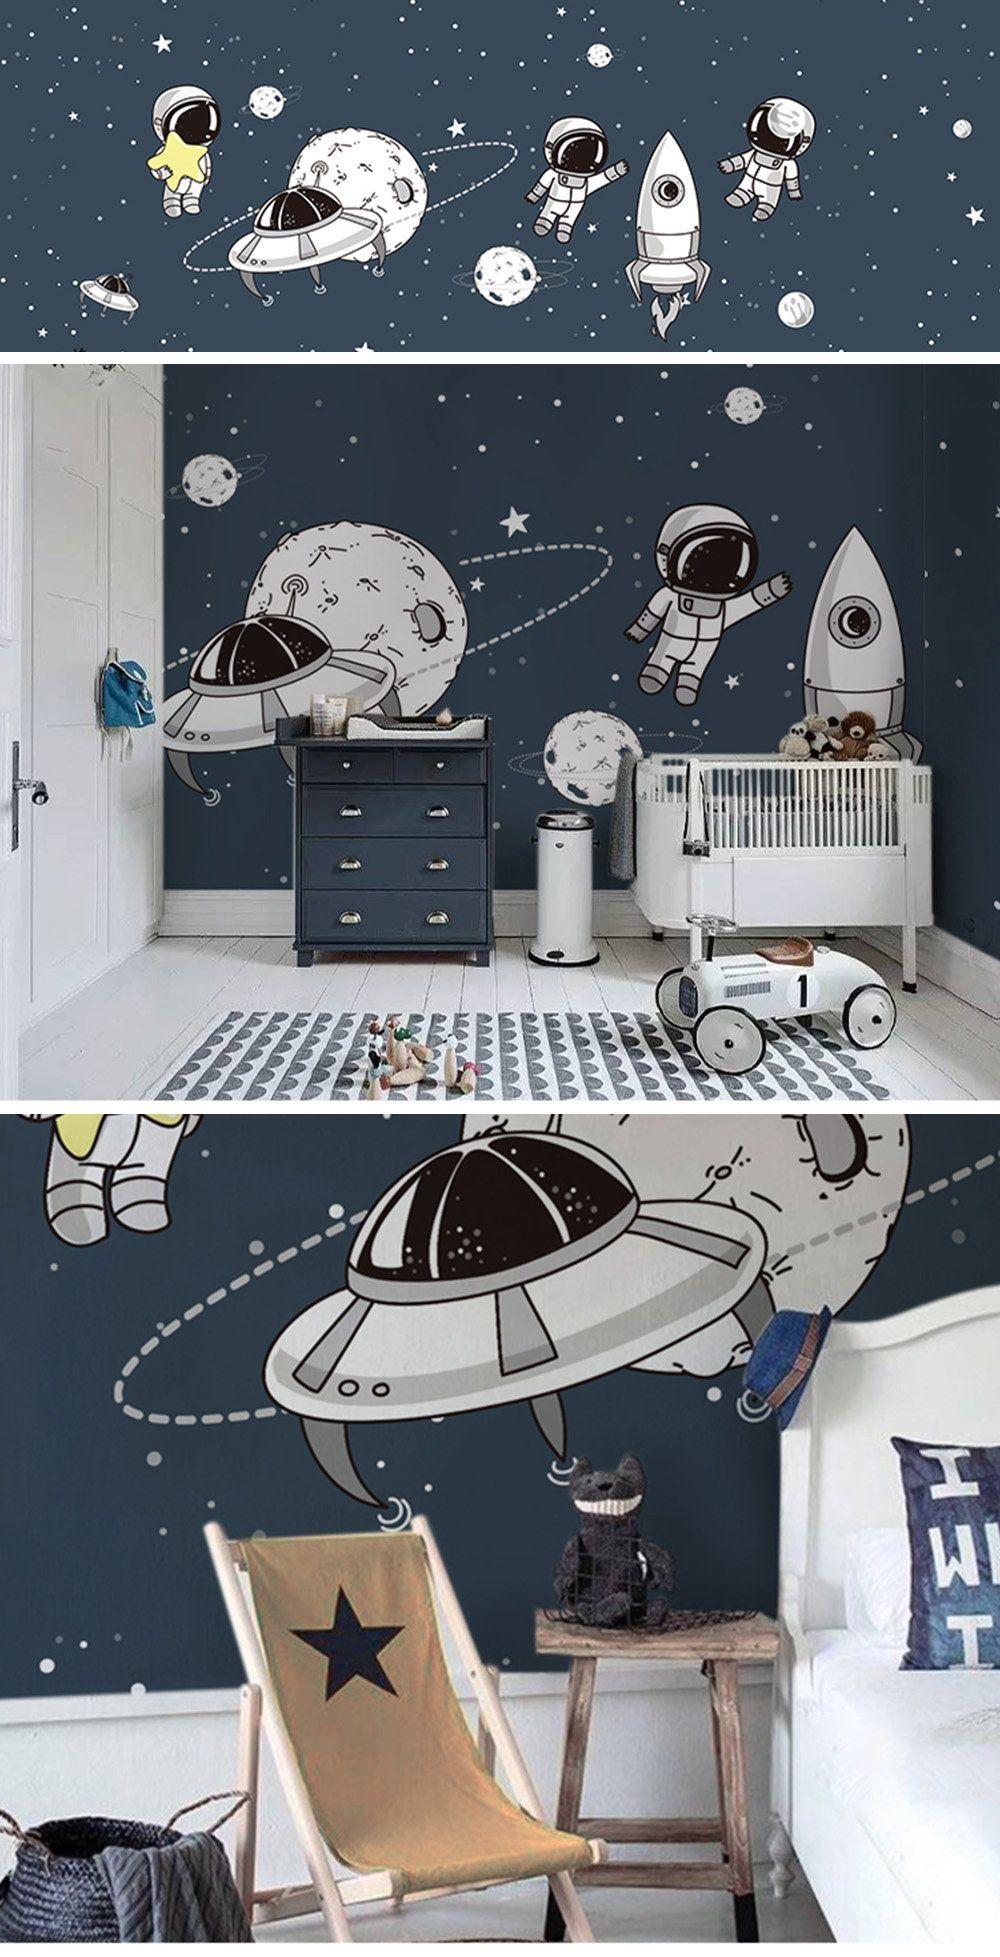 Cartoon Astronaut Wallpaper from Apollo Box